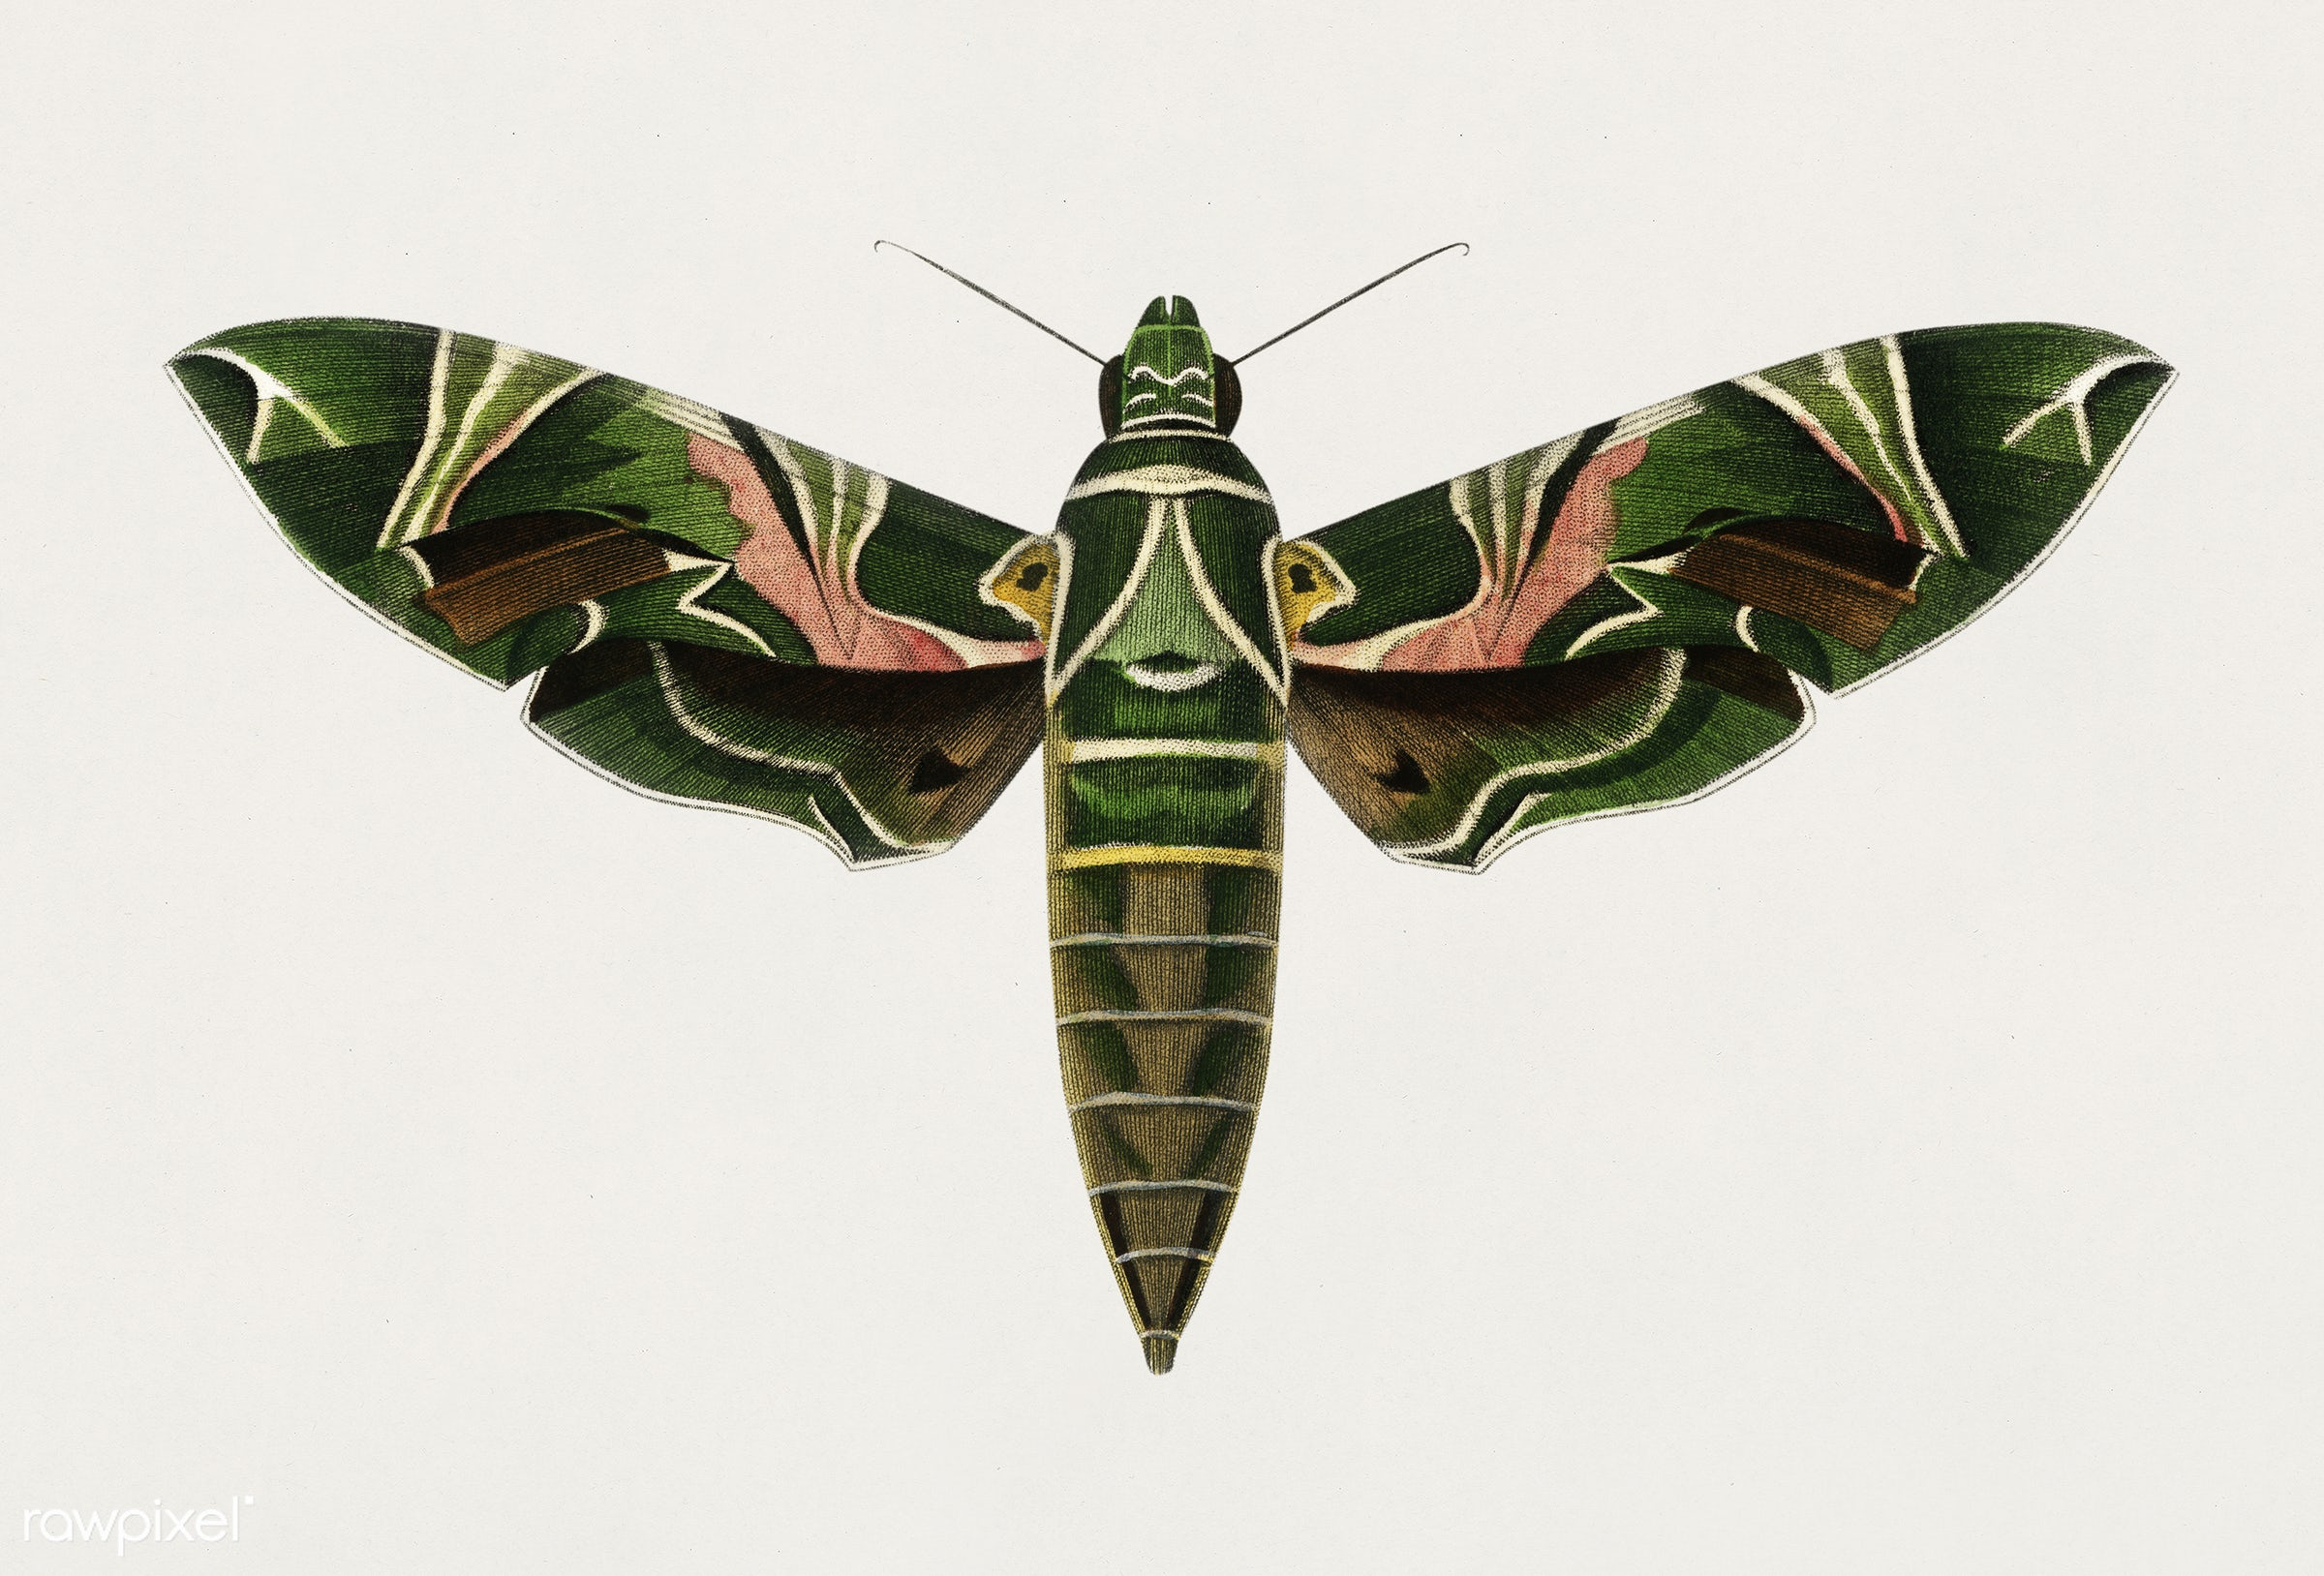 Oleander hawk-moth (daphnis nerii) illustrated by Charles Dessalines D' Orbigny (1806-1876). Digitally enhanced from our...